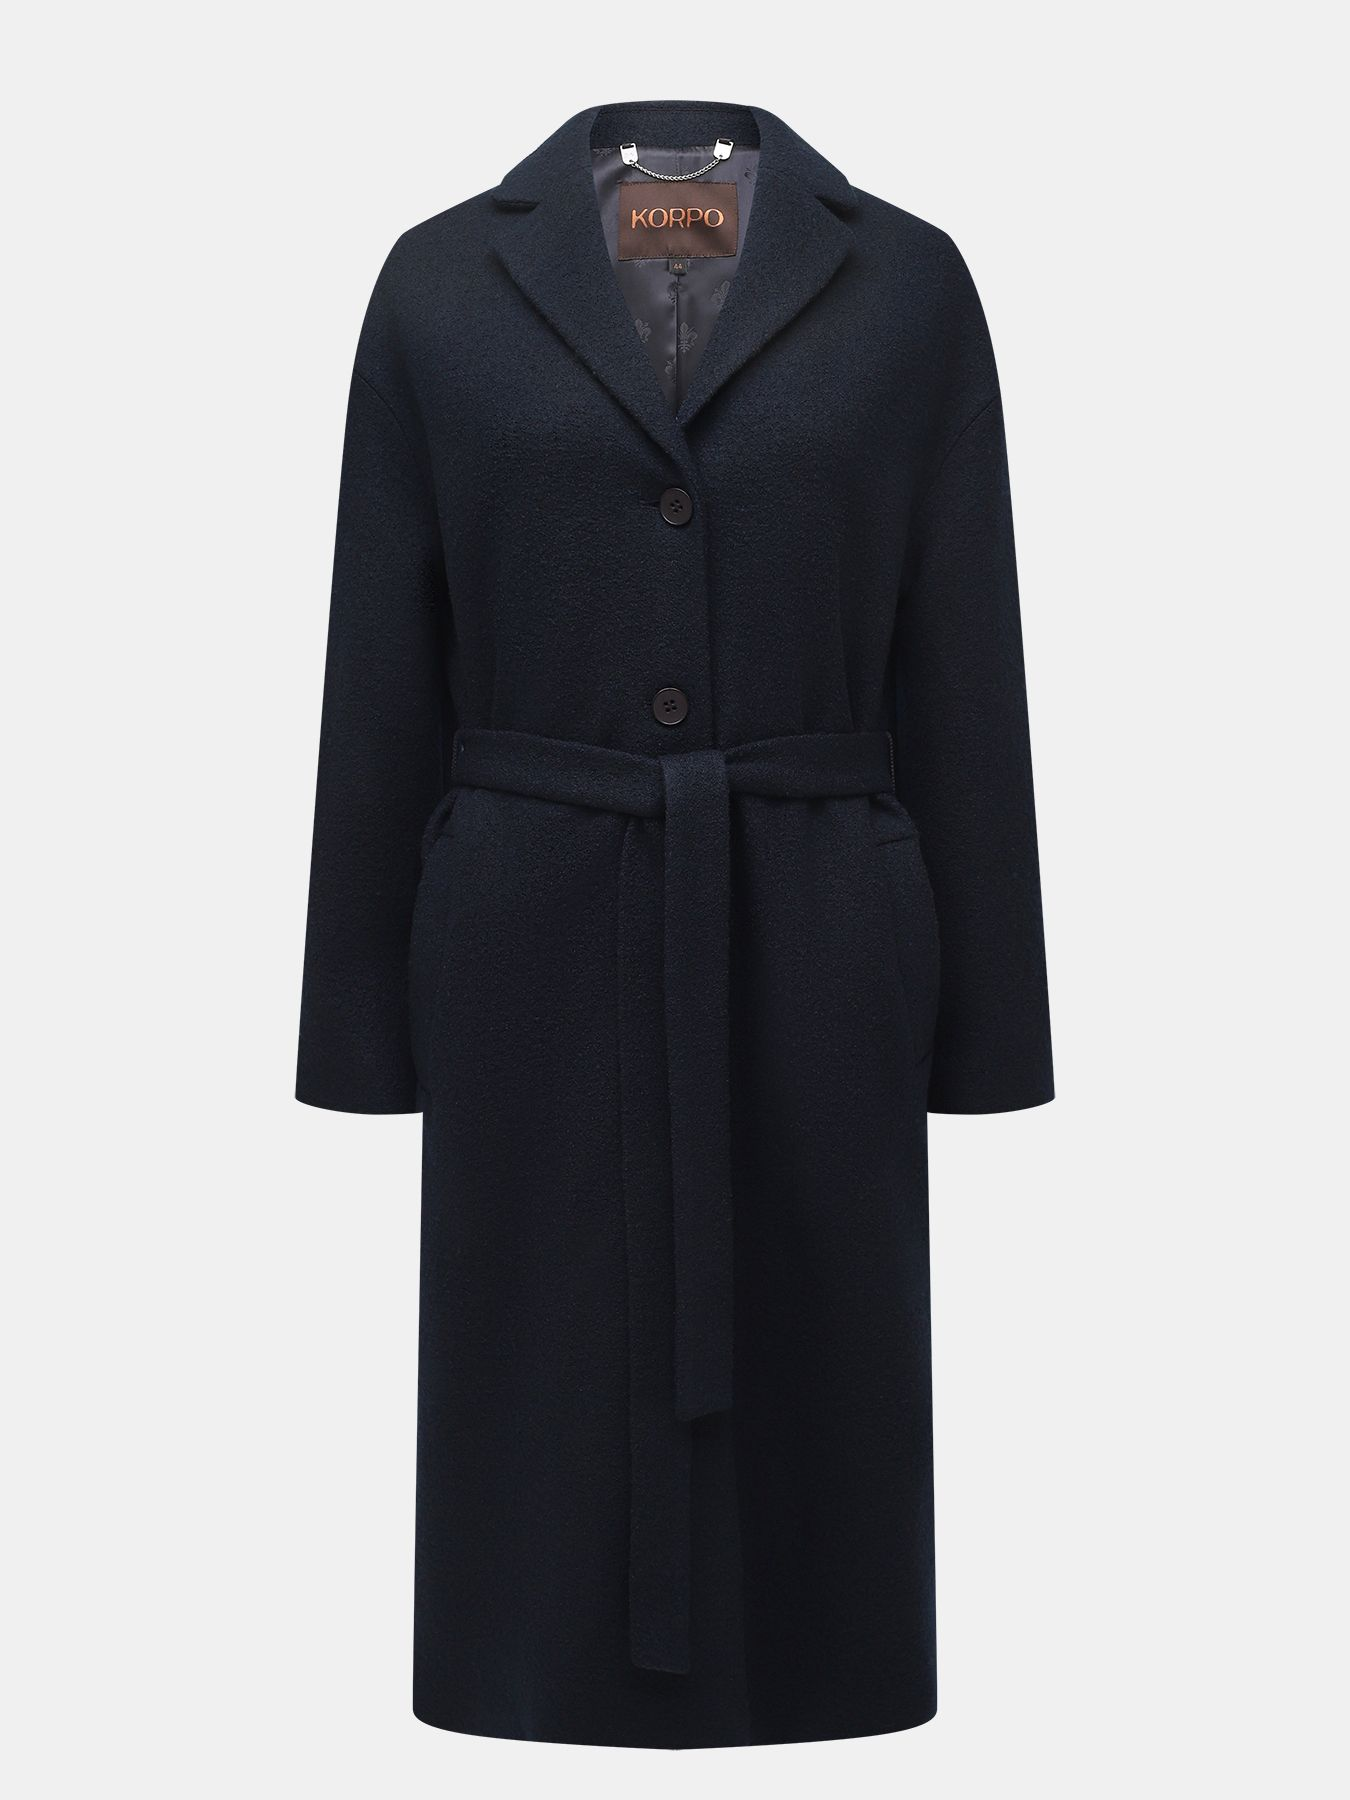 Пальто Korpo Пальто пальто korpo длинное пальто